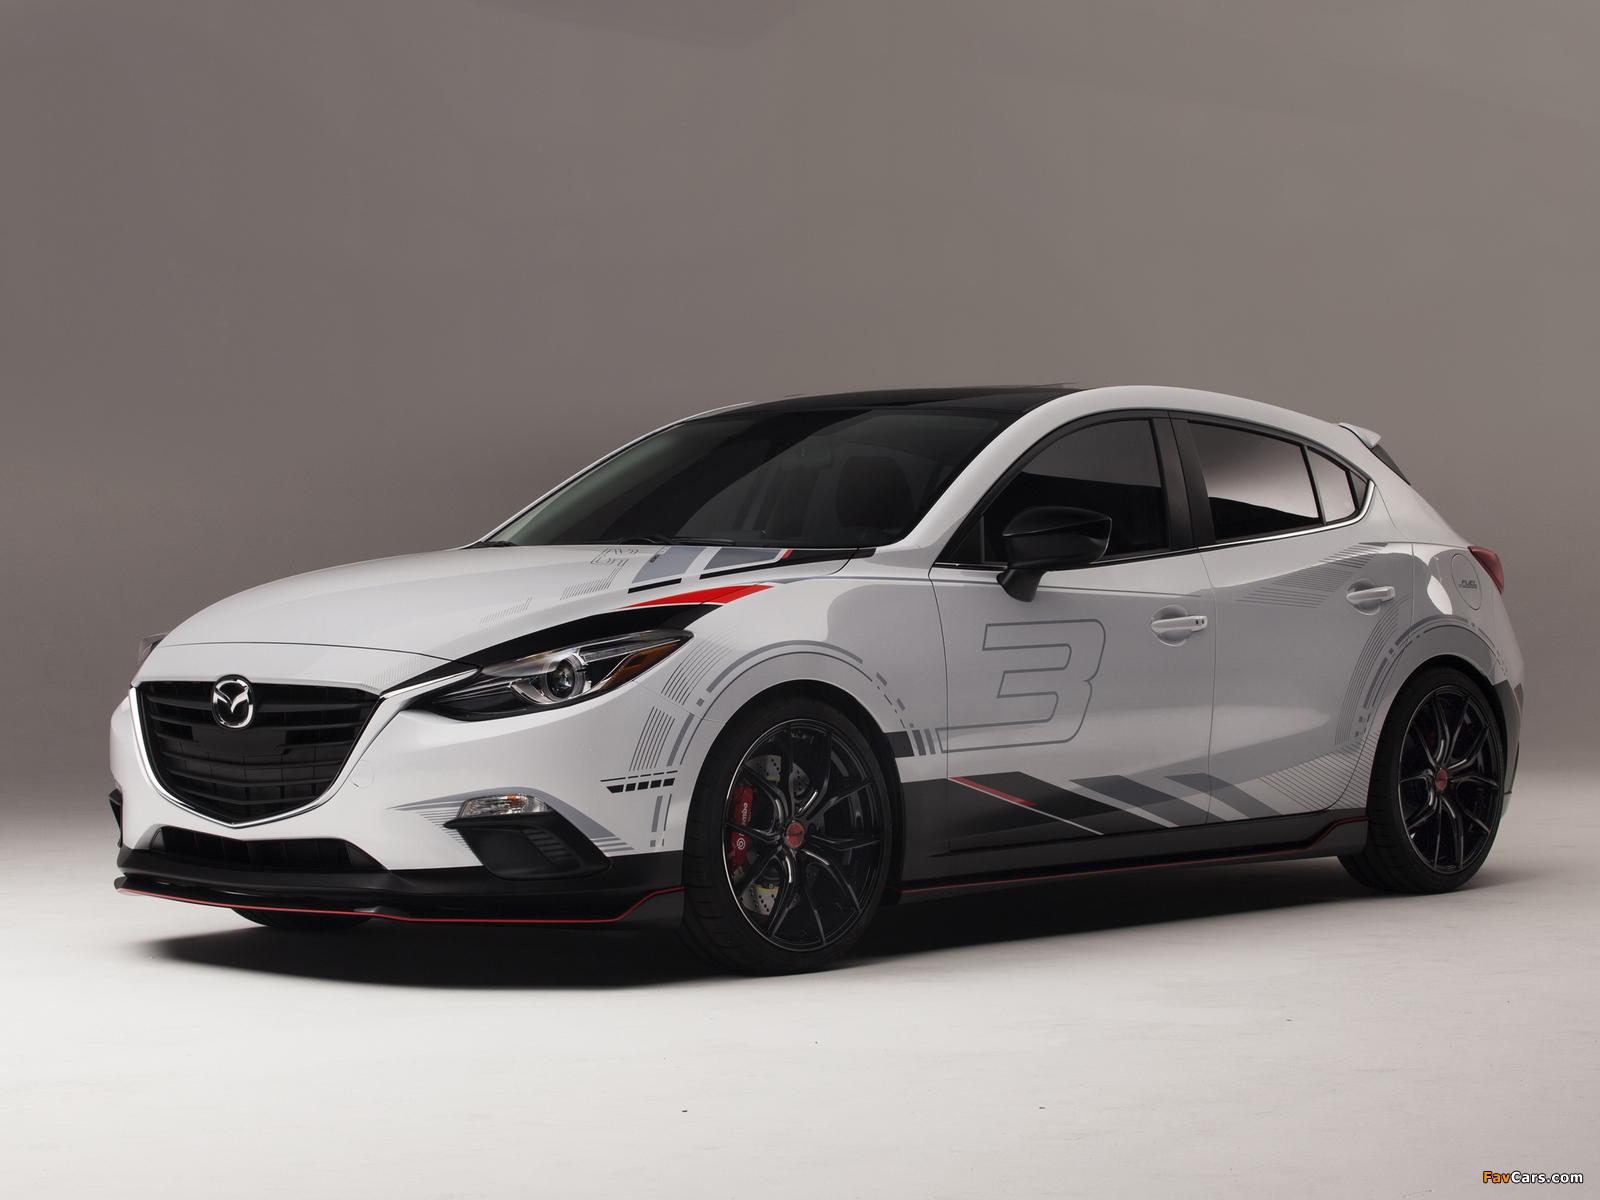 Mazda Club Sport 3 Concept (BM) 2013 pictures (1600 x 1200)